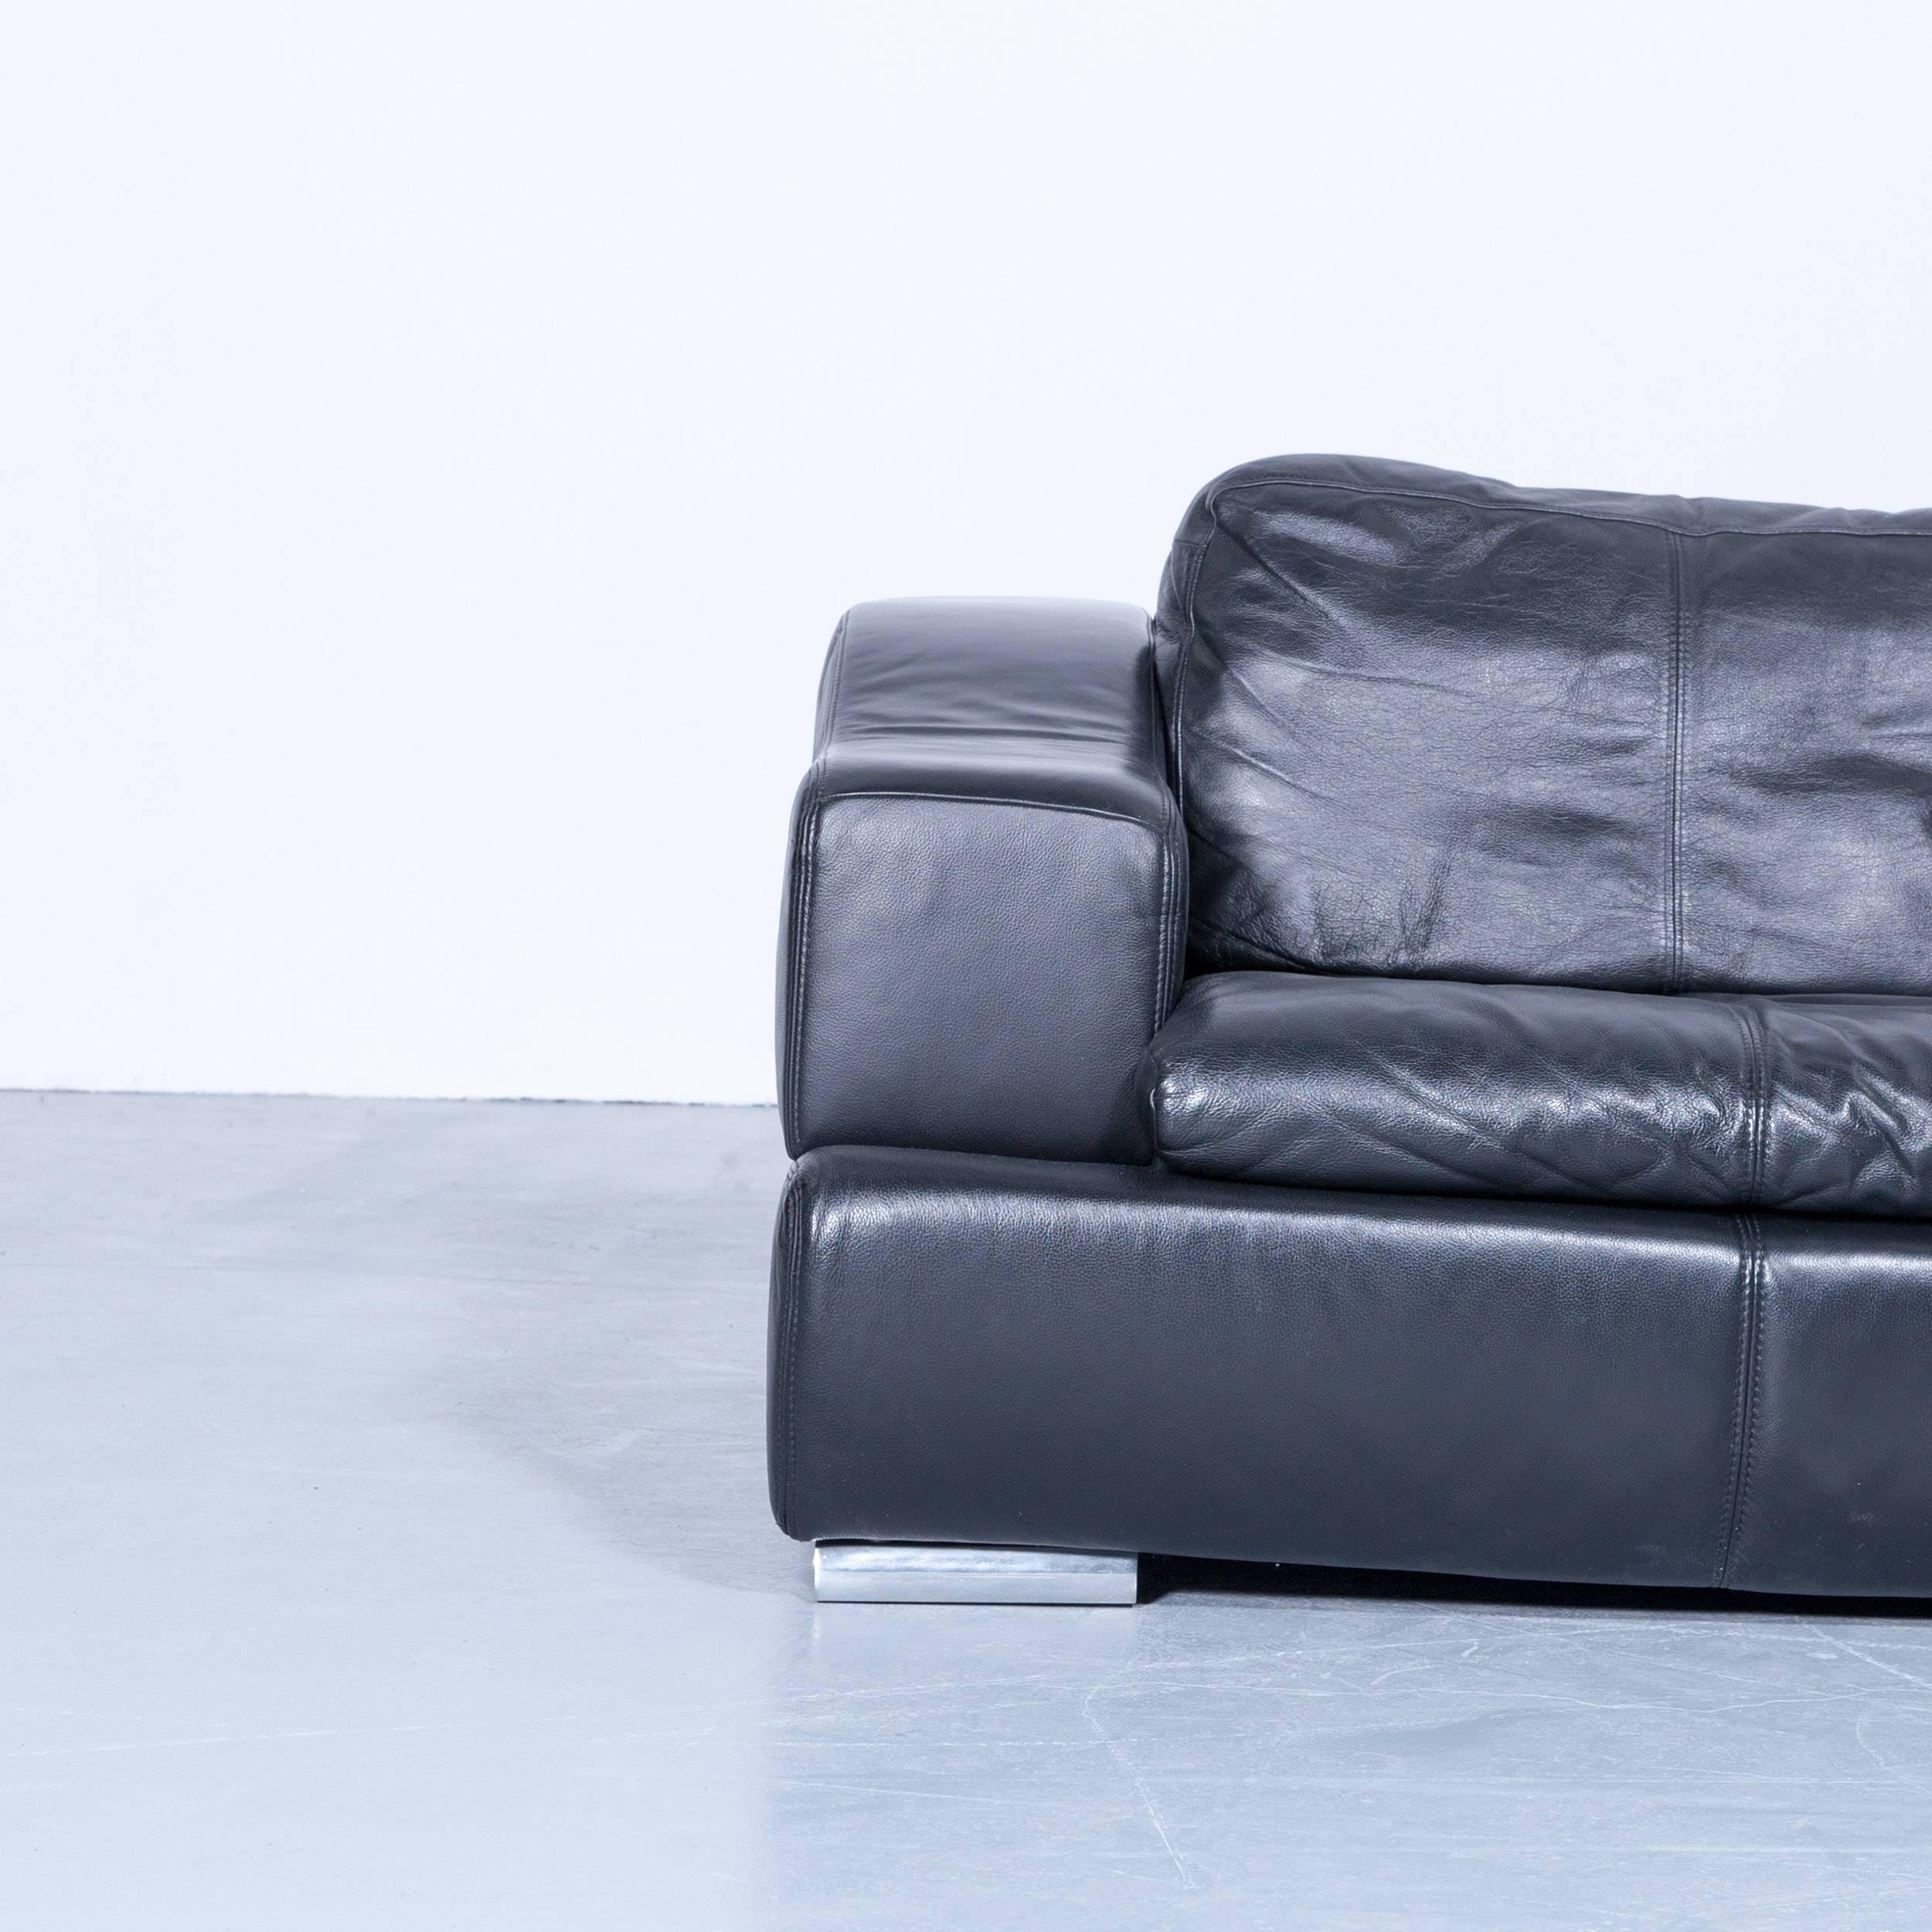 couch hocker schwarz cool top ergebnis best of sofa hocker bilder uqw with big sofa hocker with. Black Bedroom Furniture Sets. Home Design Ideas